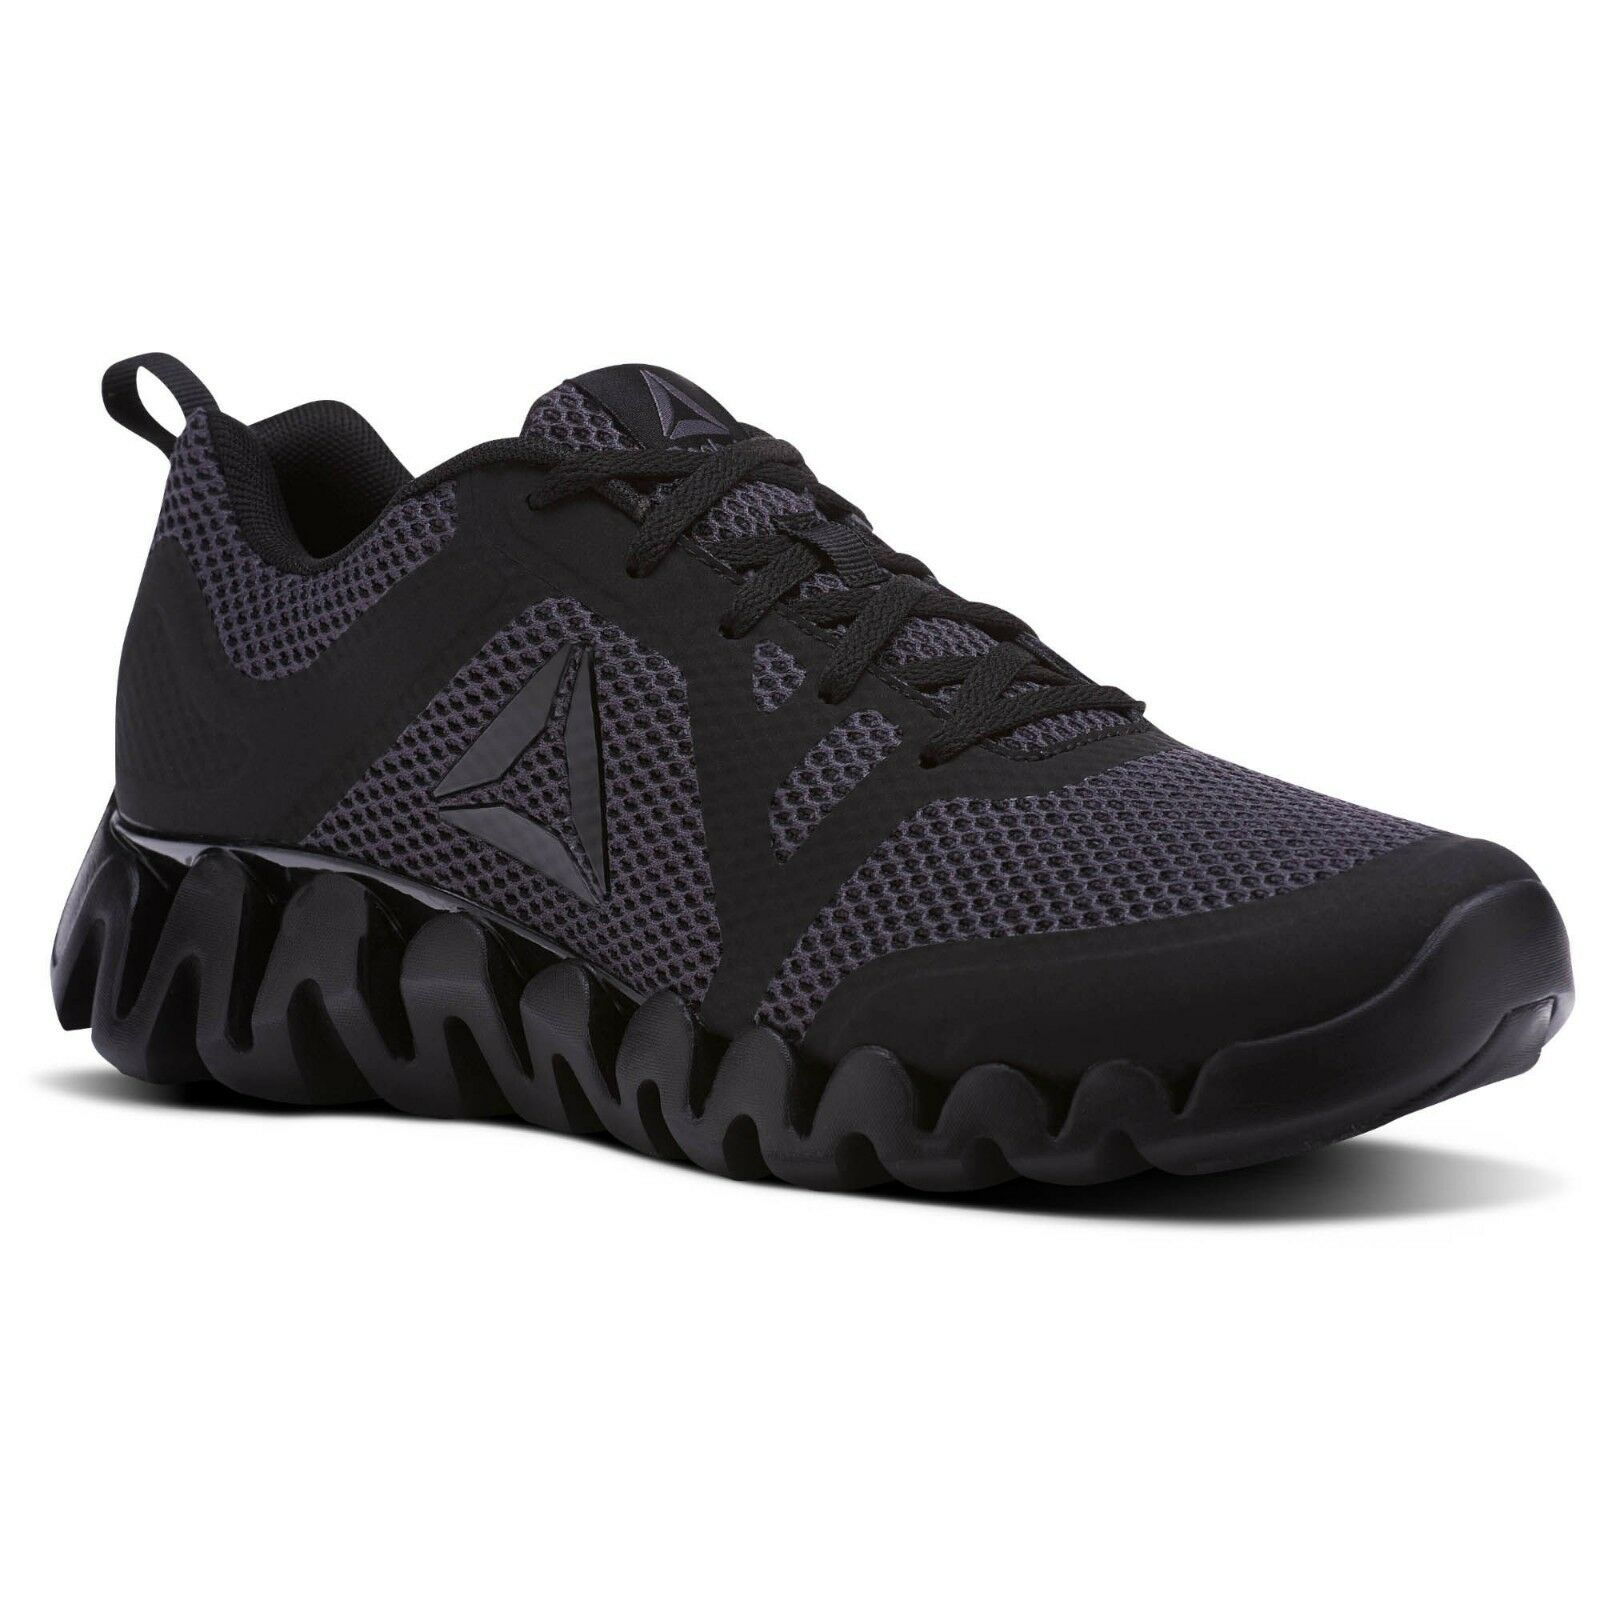 Reebok Zig Evolution 2.0 hommes noir / Ash Gris Running Chaussures CM9857 All Sizes